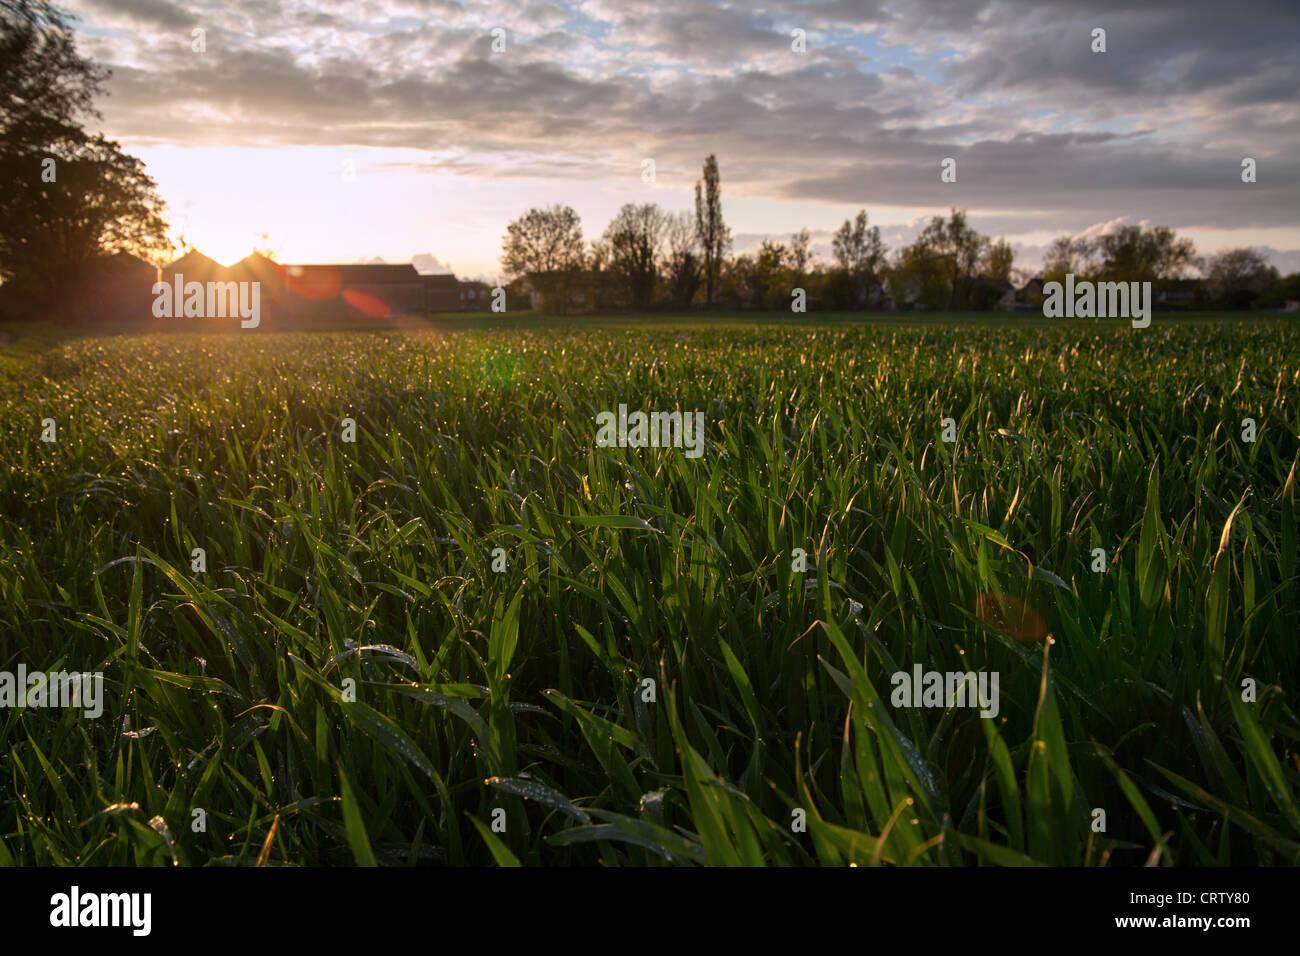 Stapleford farm Cambridge - Stock Image